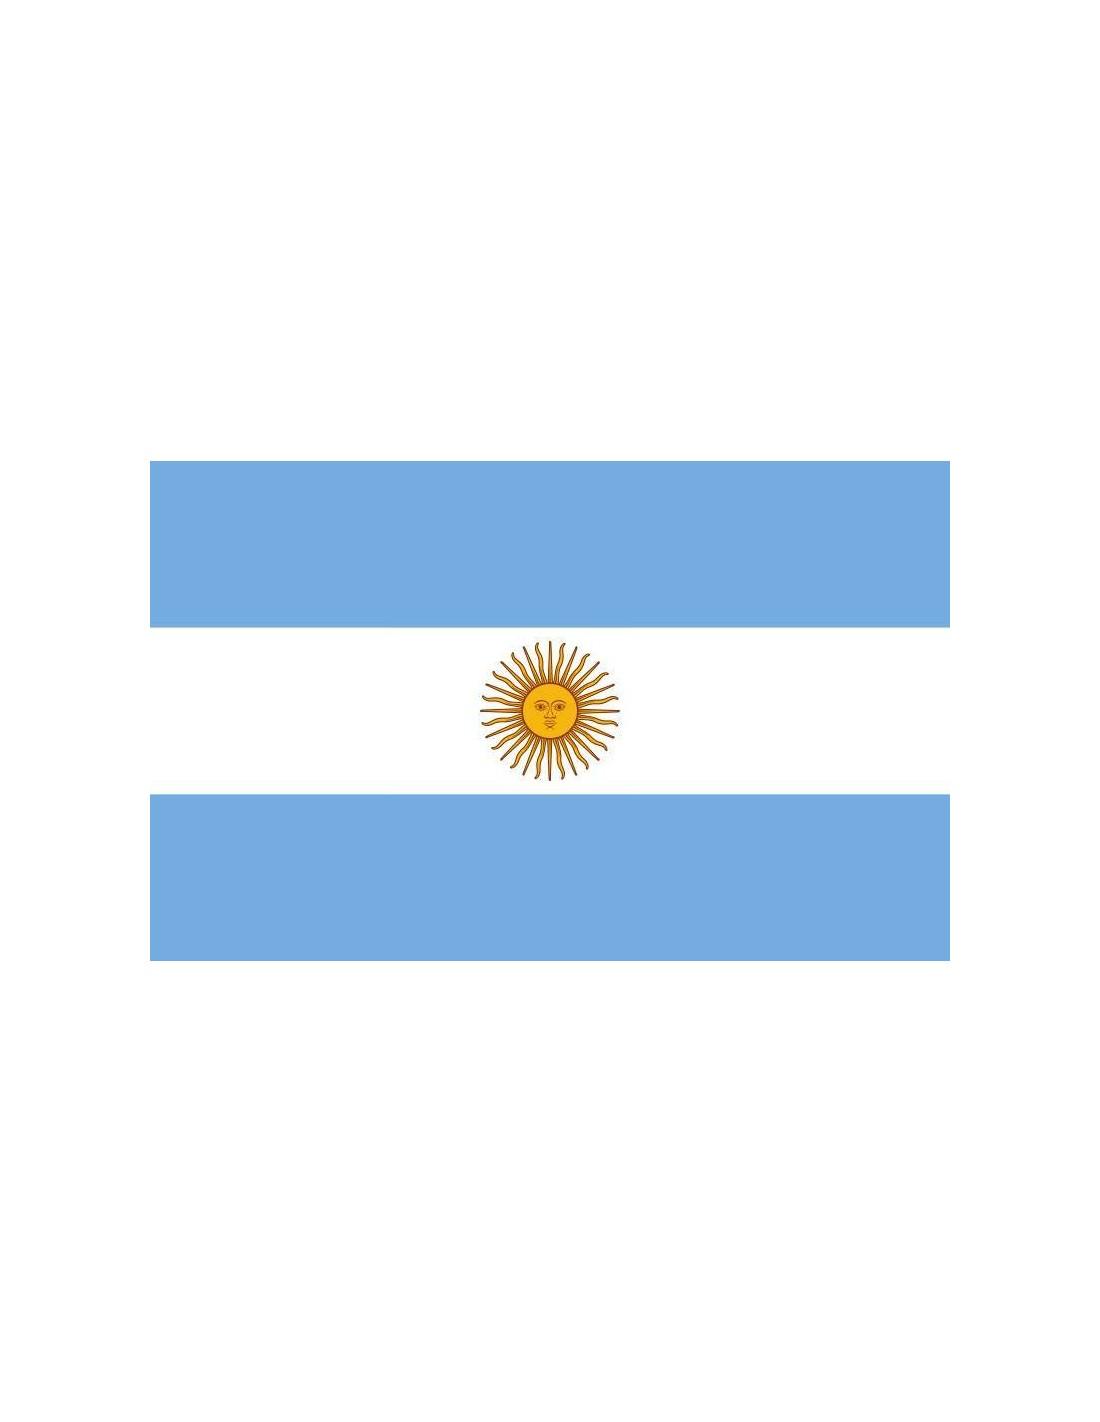 bandera-argentina-.jpg